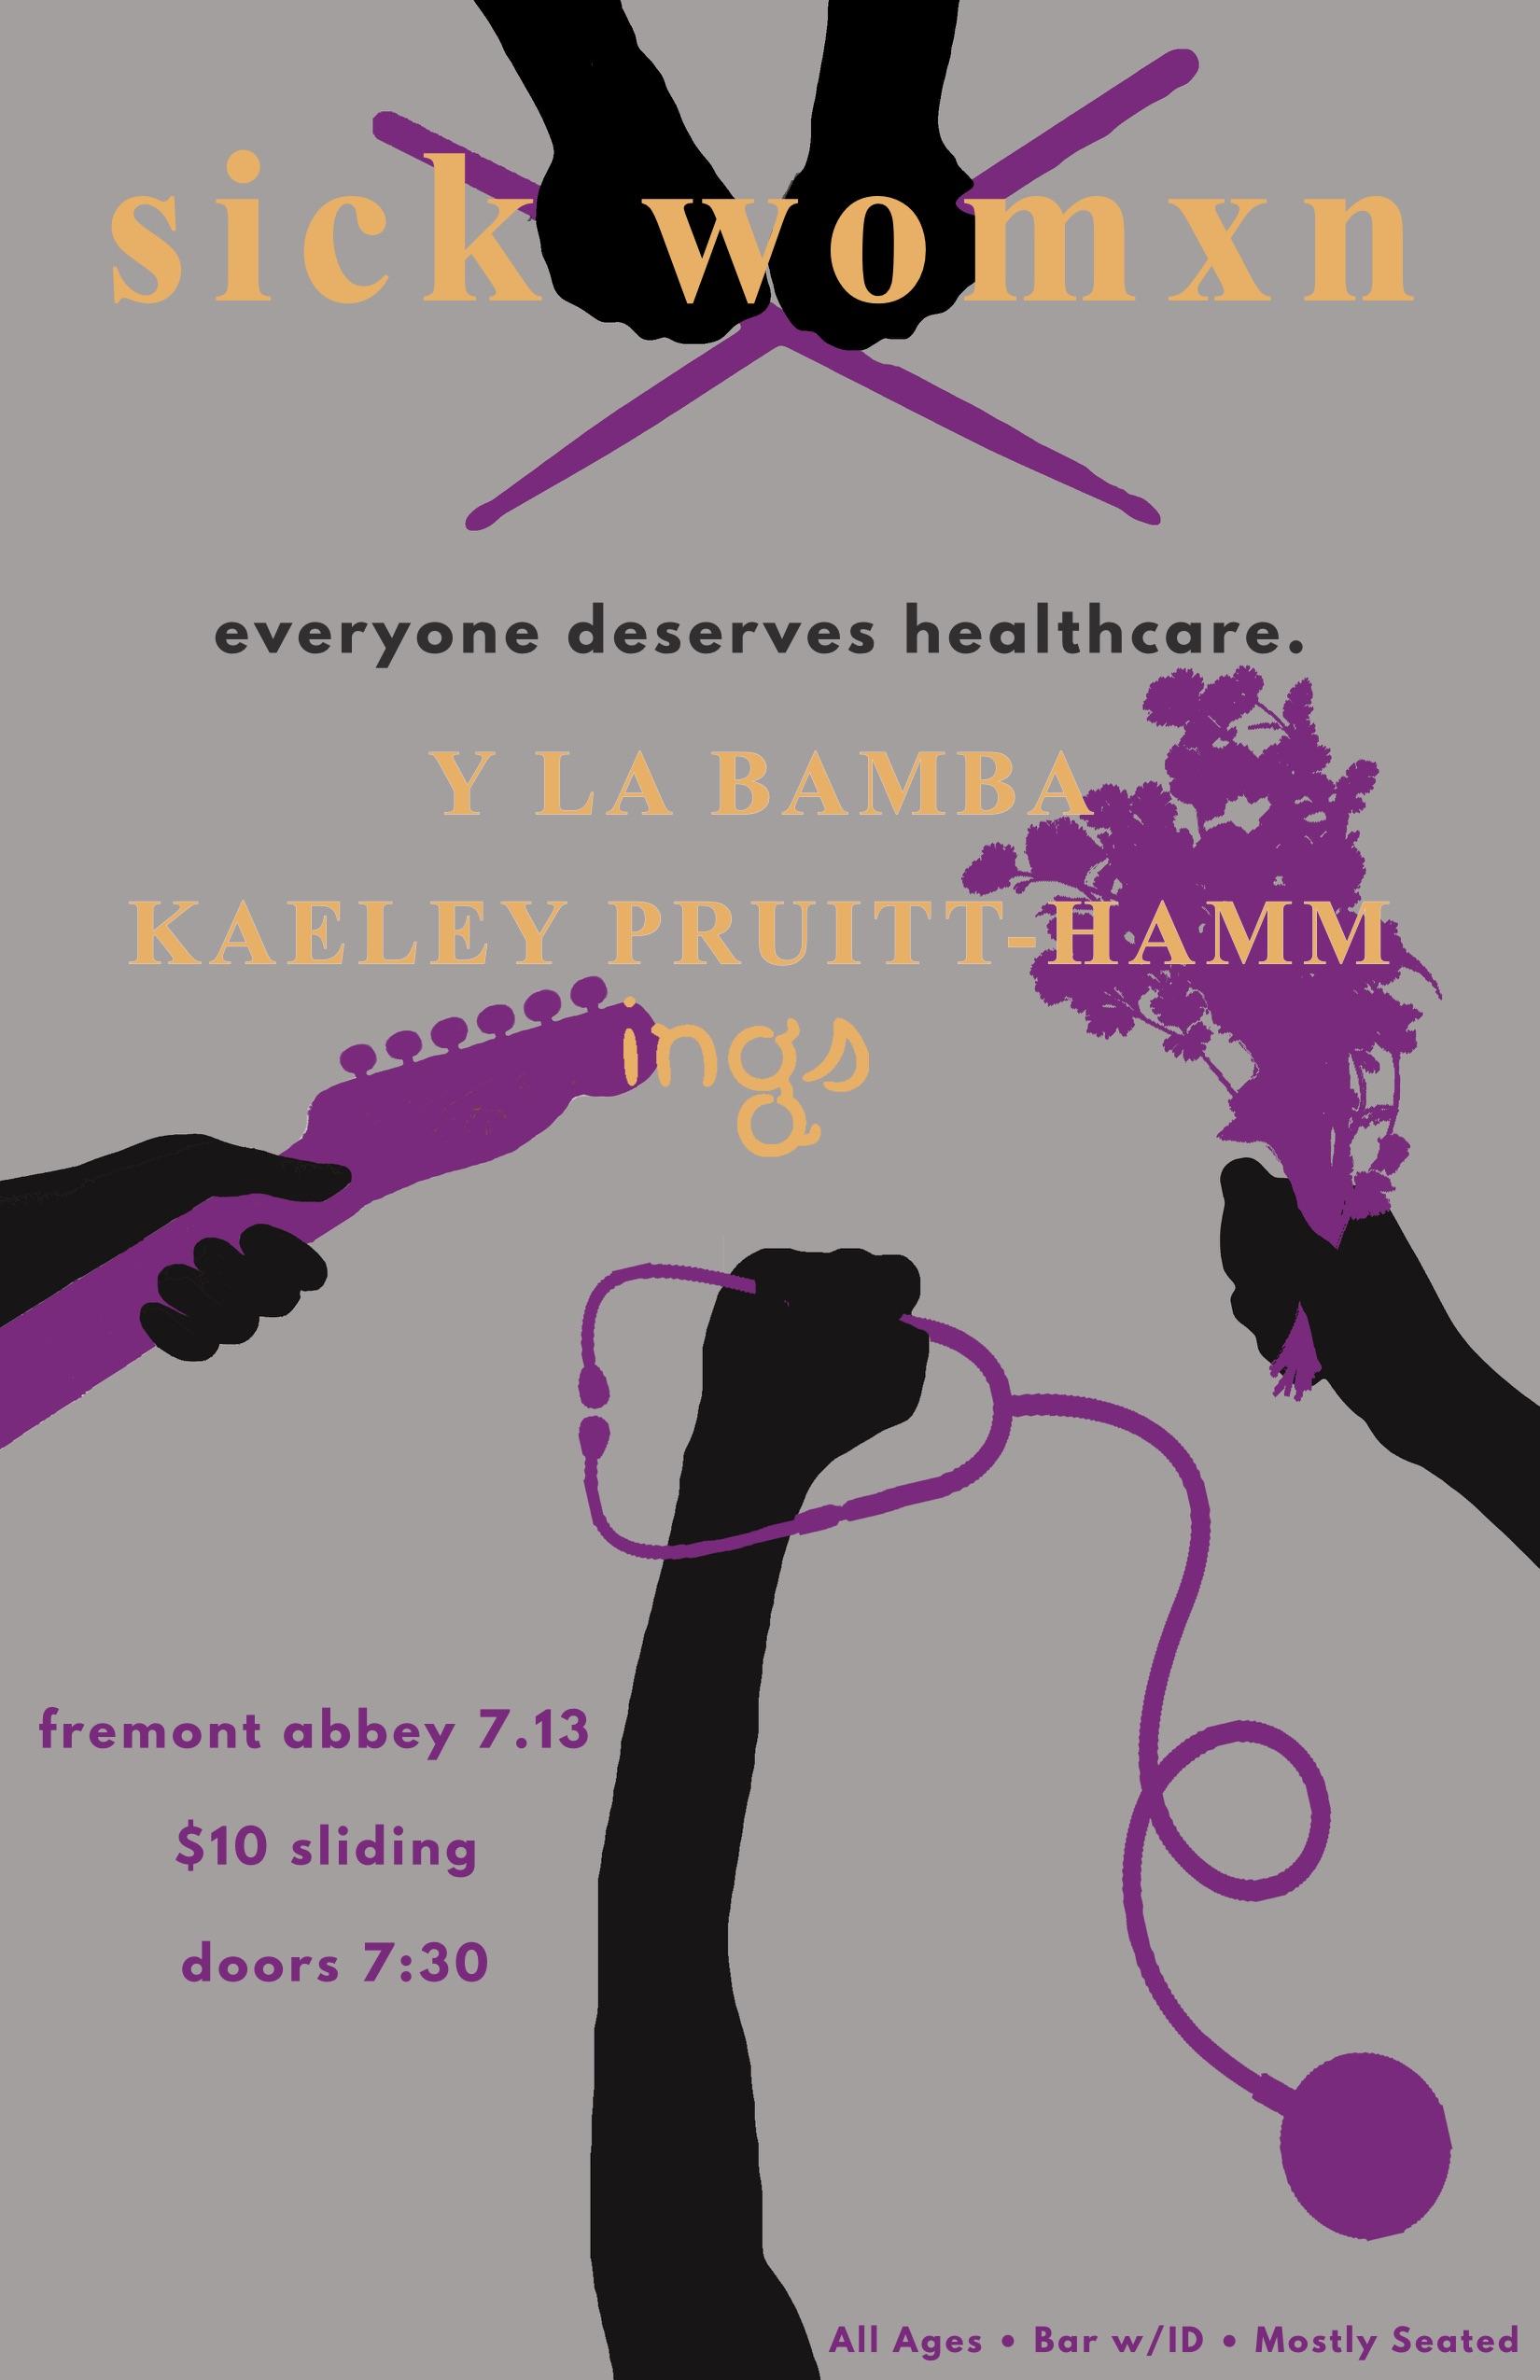 Kaeley Pruitt-Hamm performance